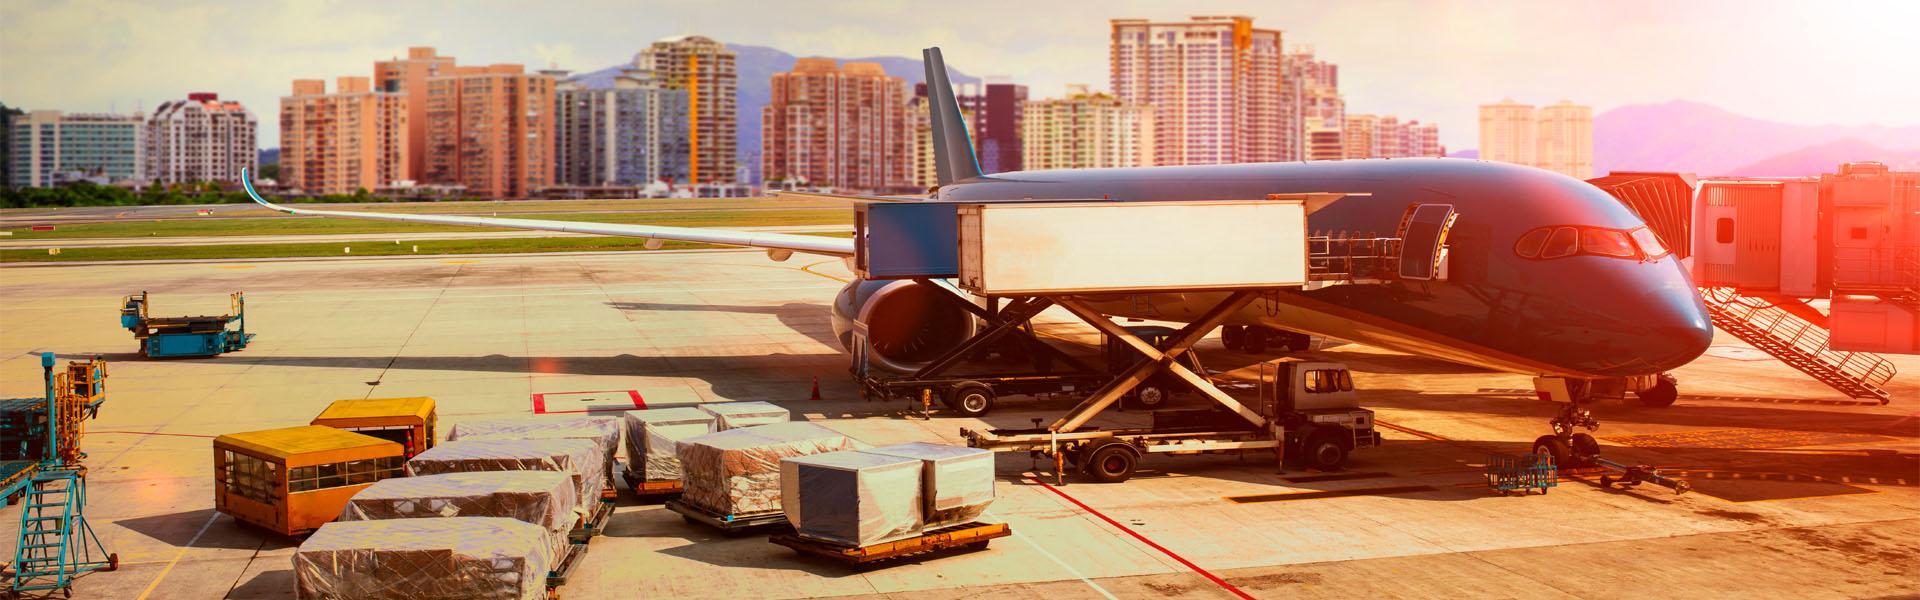 Air Freight - Blitz Logistics Limited